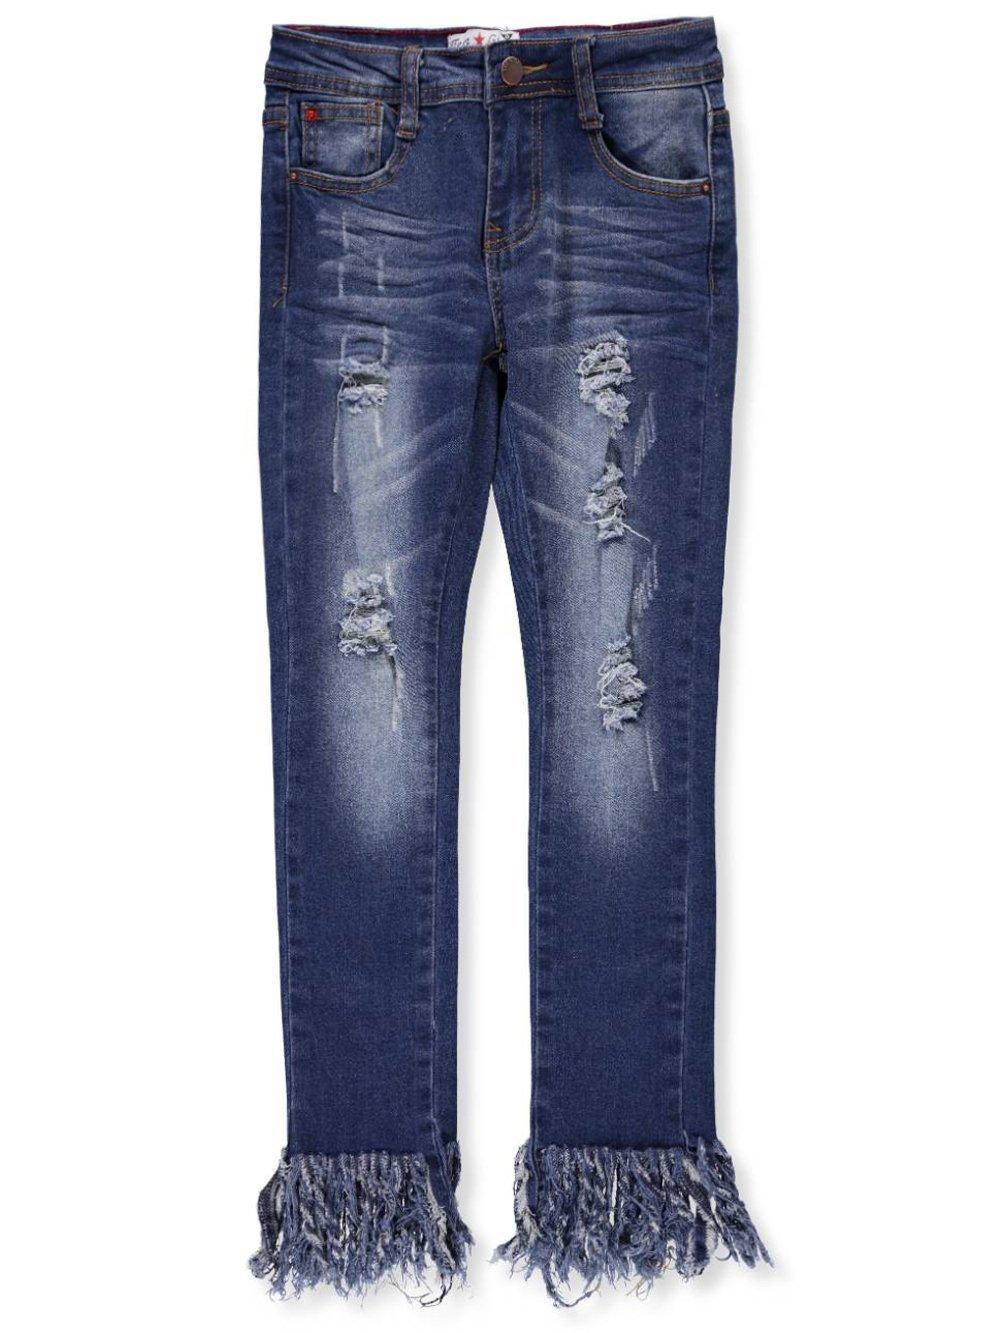 Teen G's Girls' Jeans Teen G's Girls' Jeans